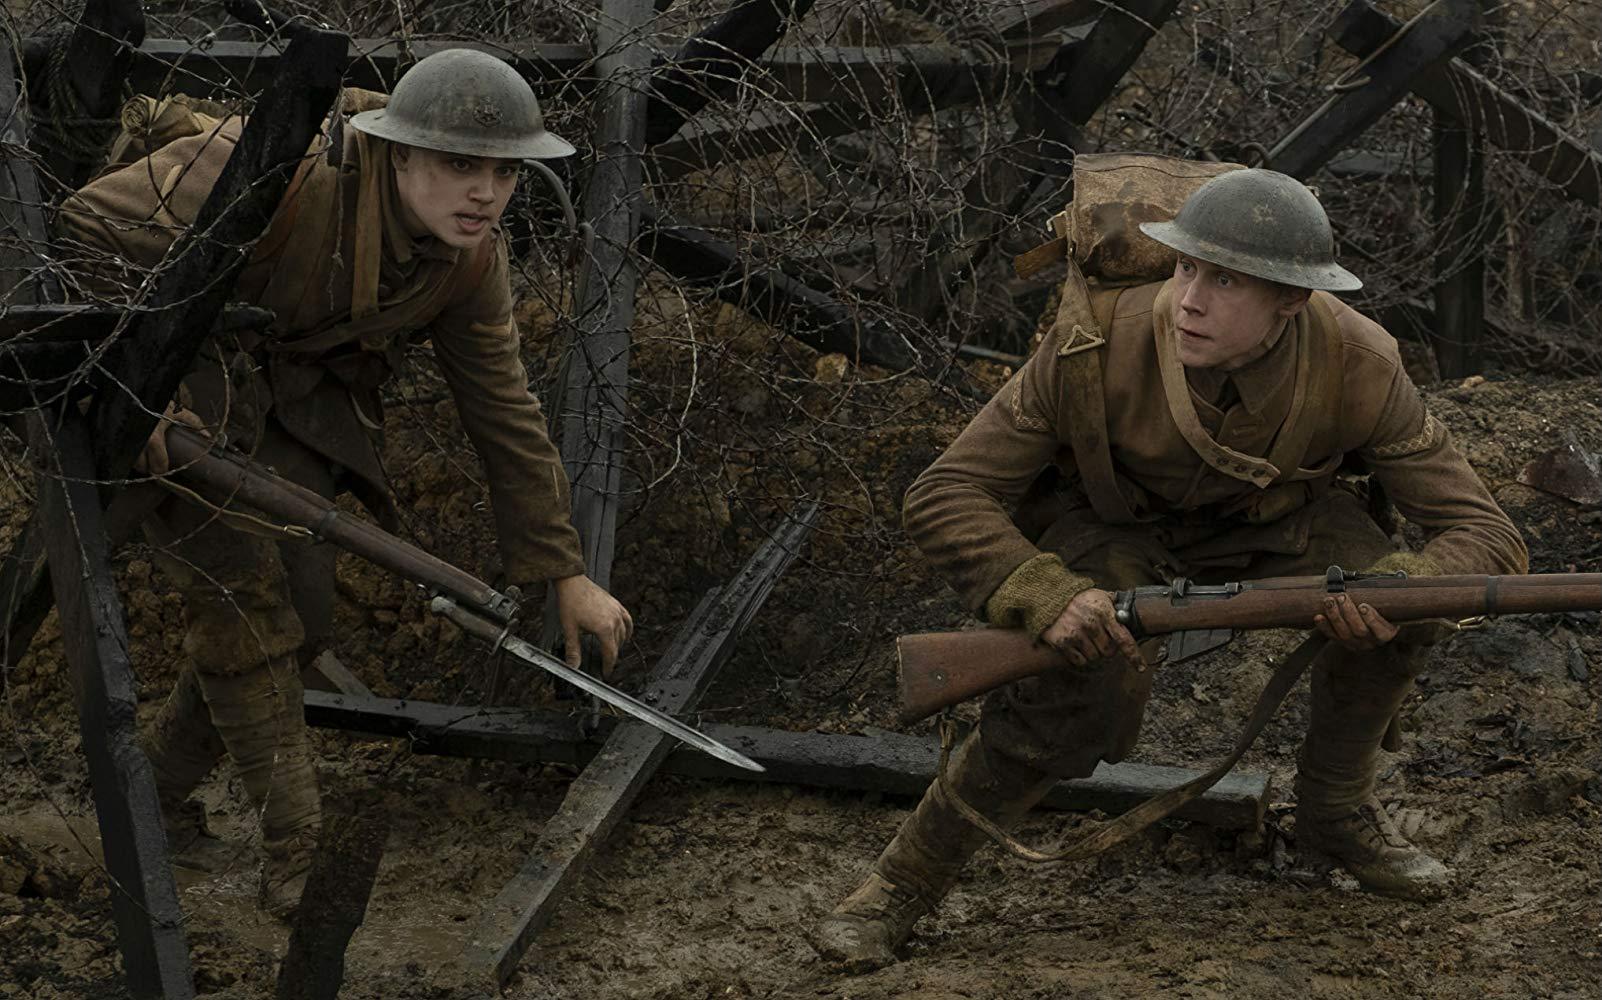 1917 is a harrowing war flick